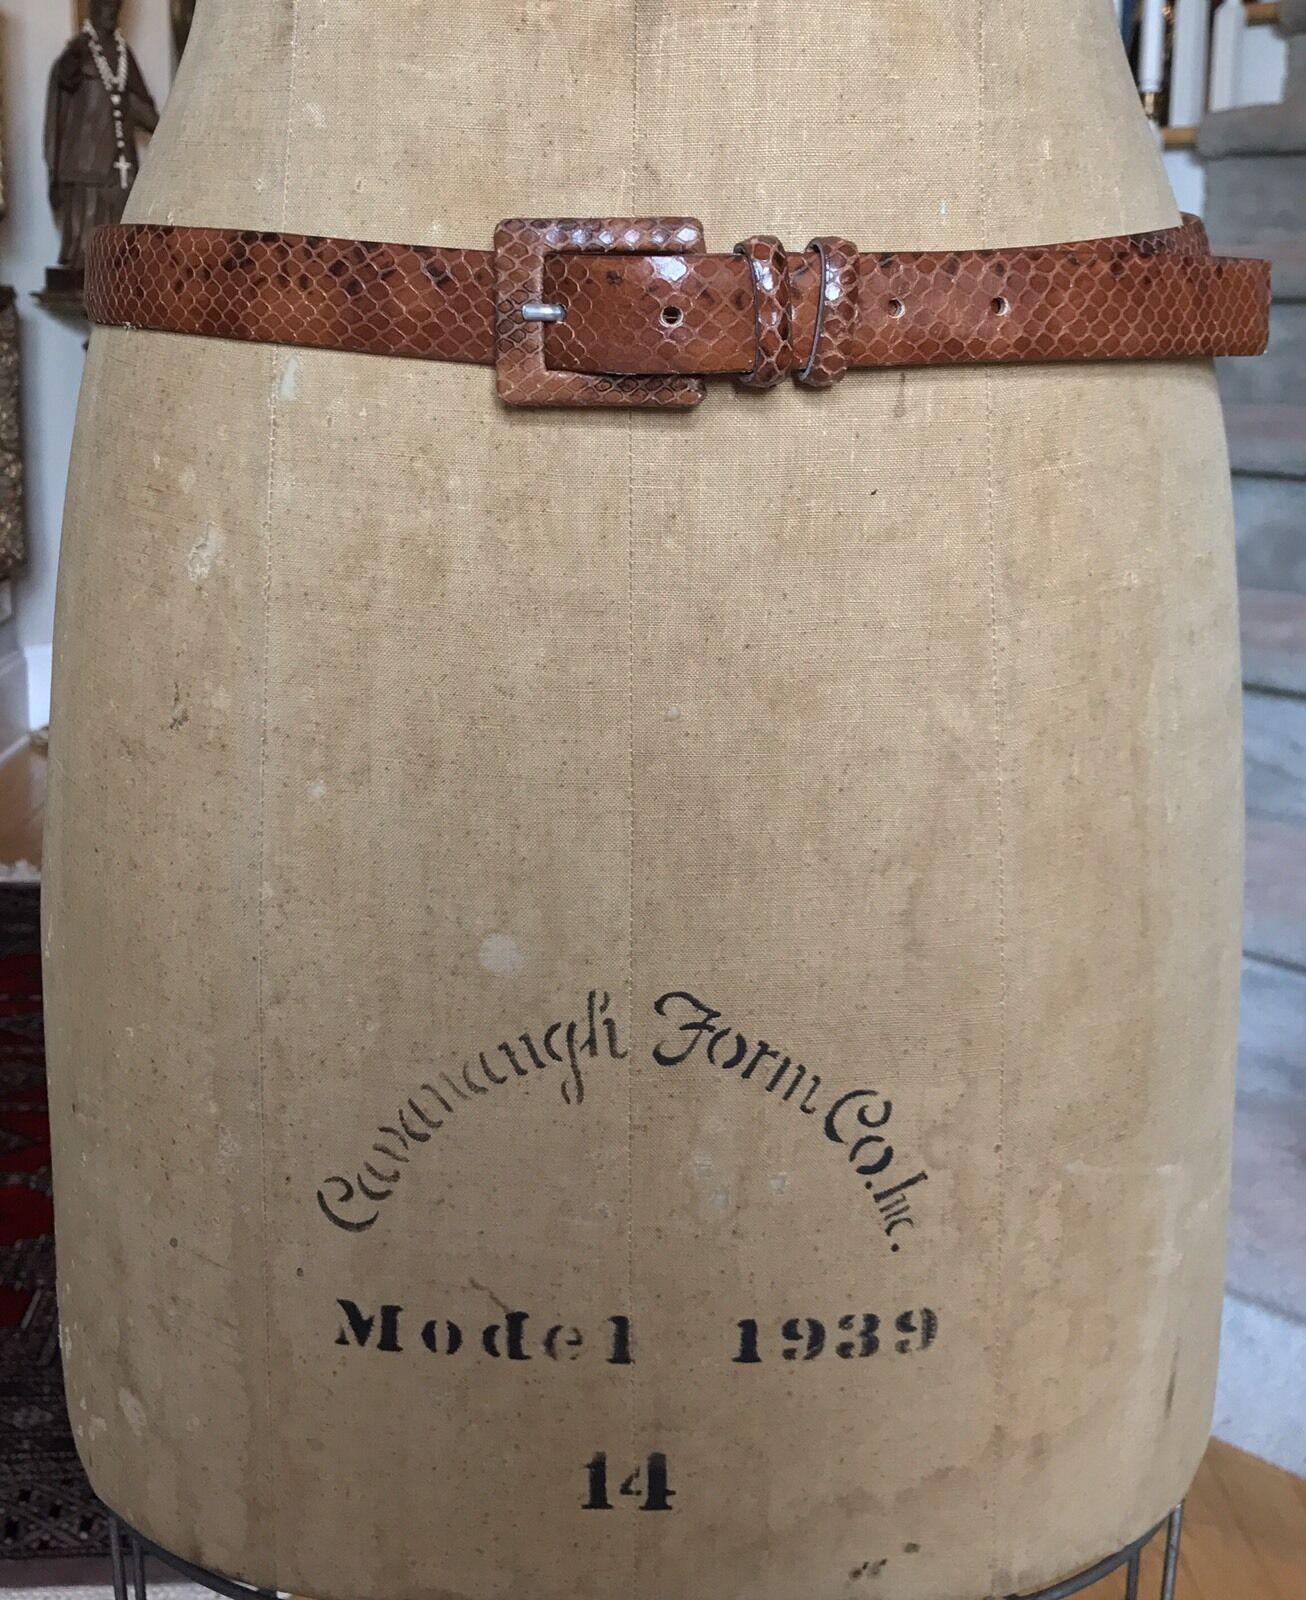 ROBERTO PICCINETTI 100% Leather Faux Snakeskin Brown Belt XLARGE XL